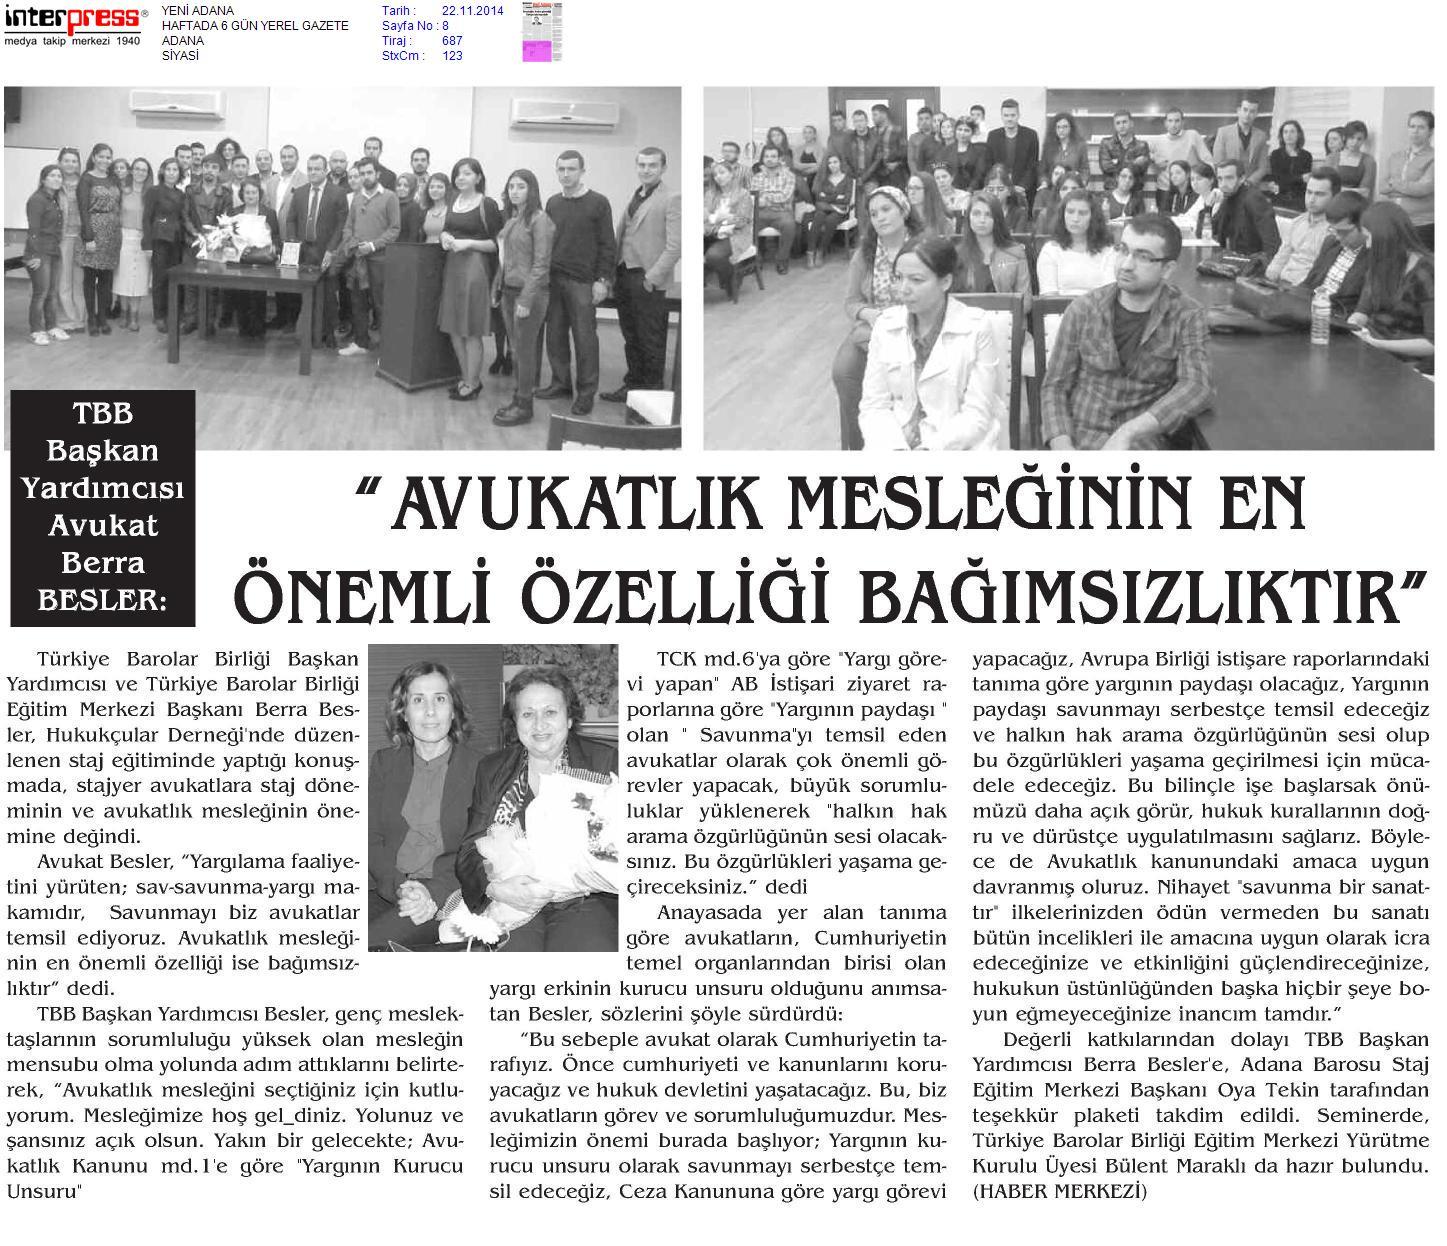 Yerel - Yeni Adana, Avukatl�k mesle�inin en �nemli �zelli�i ba��ms�zl�kt�r